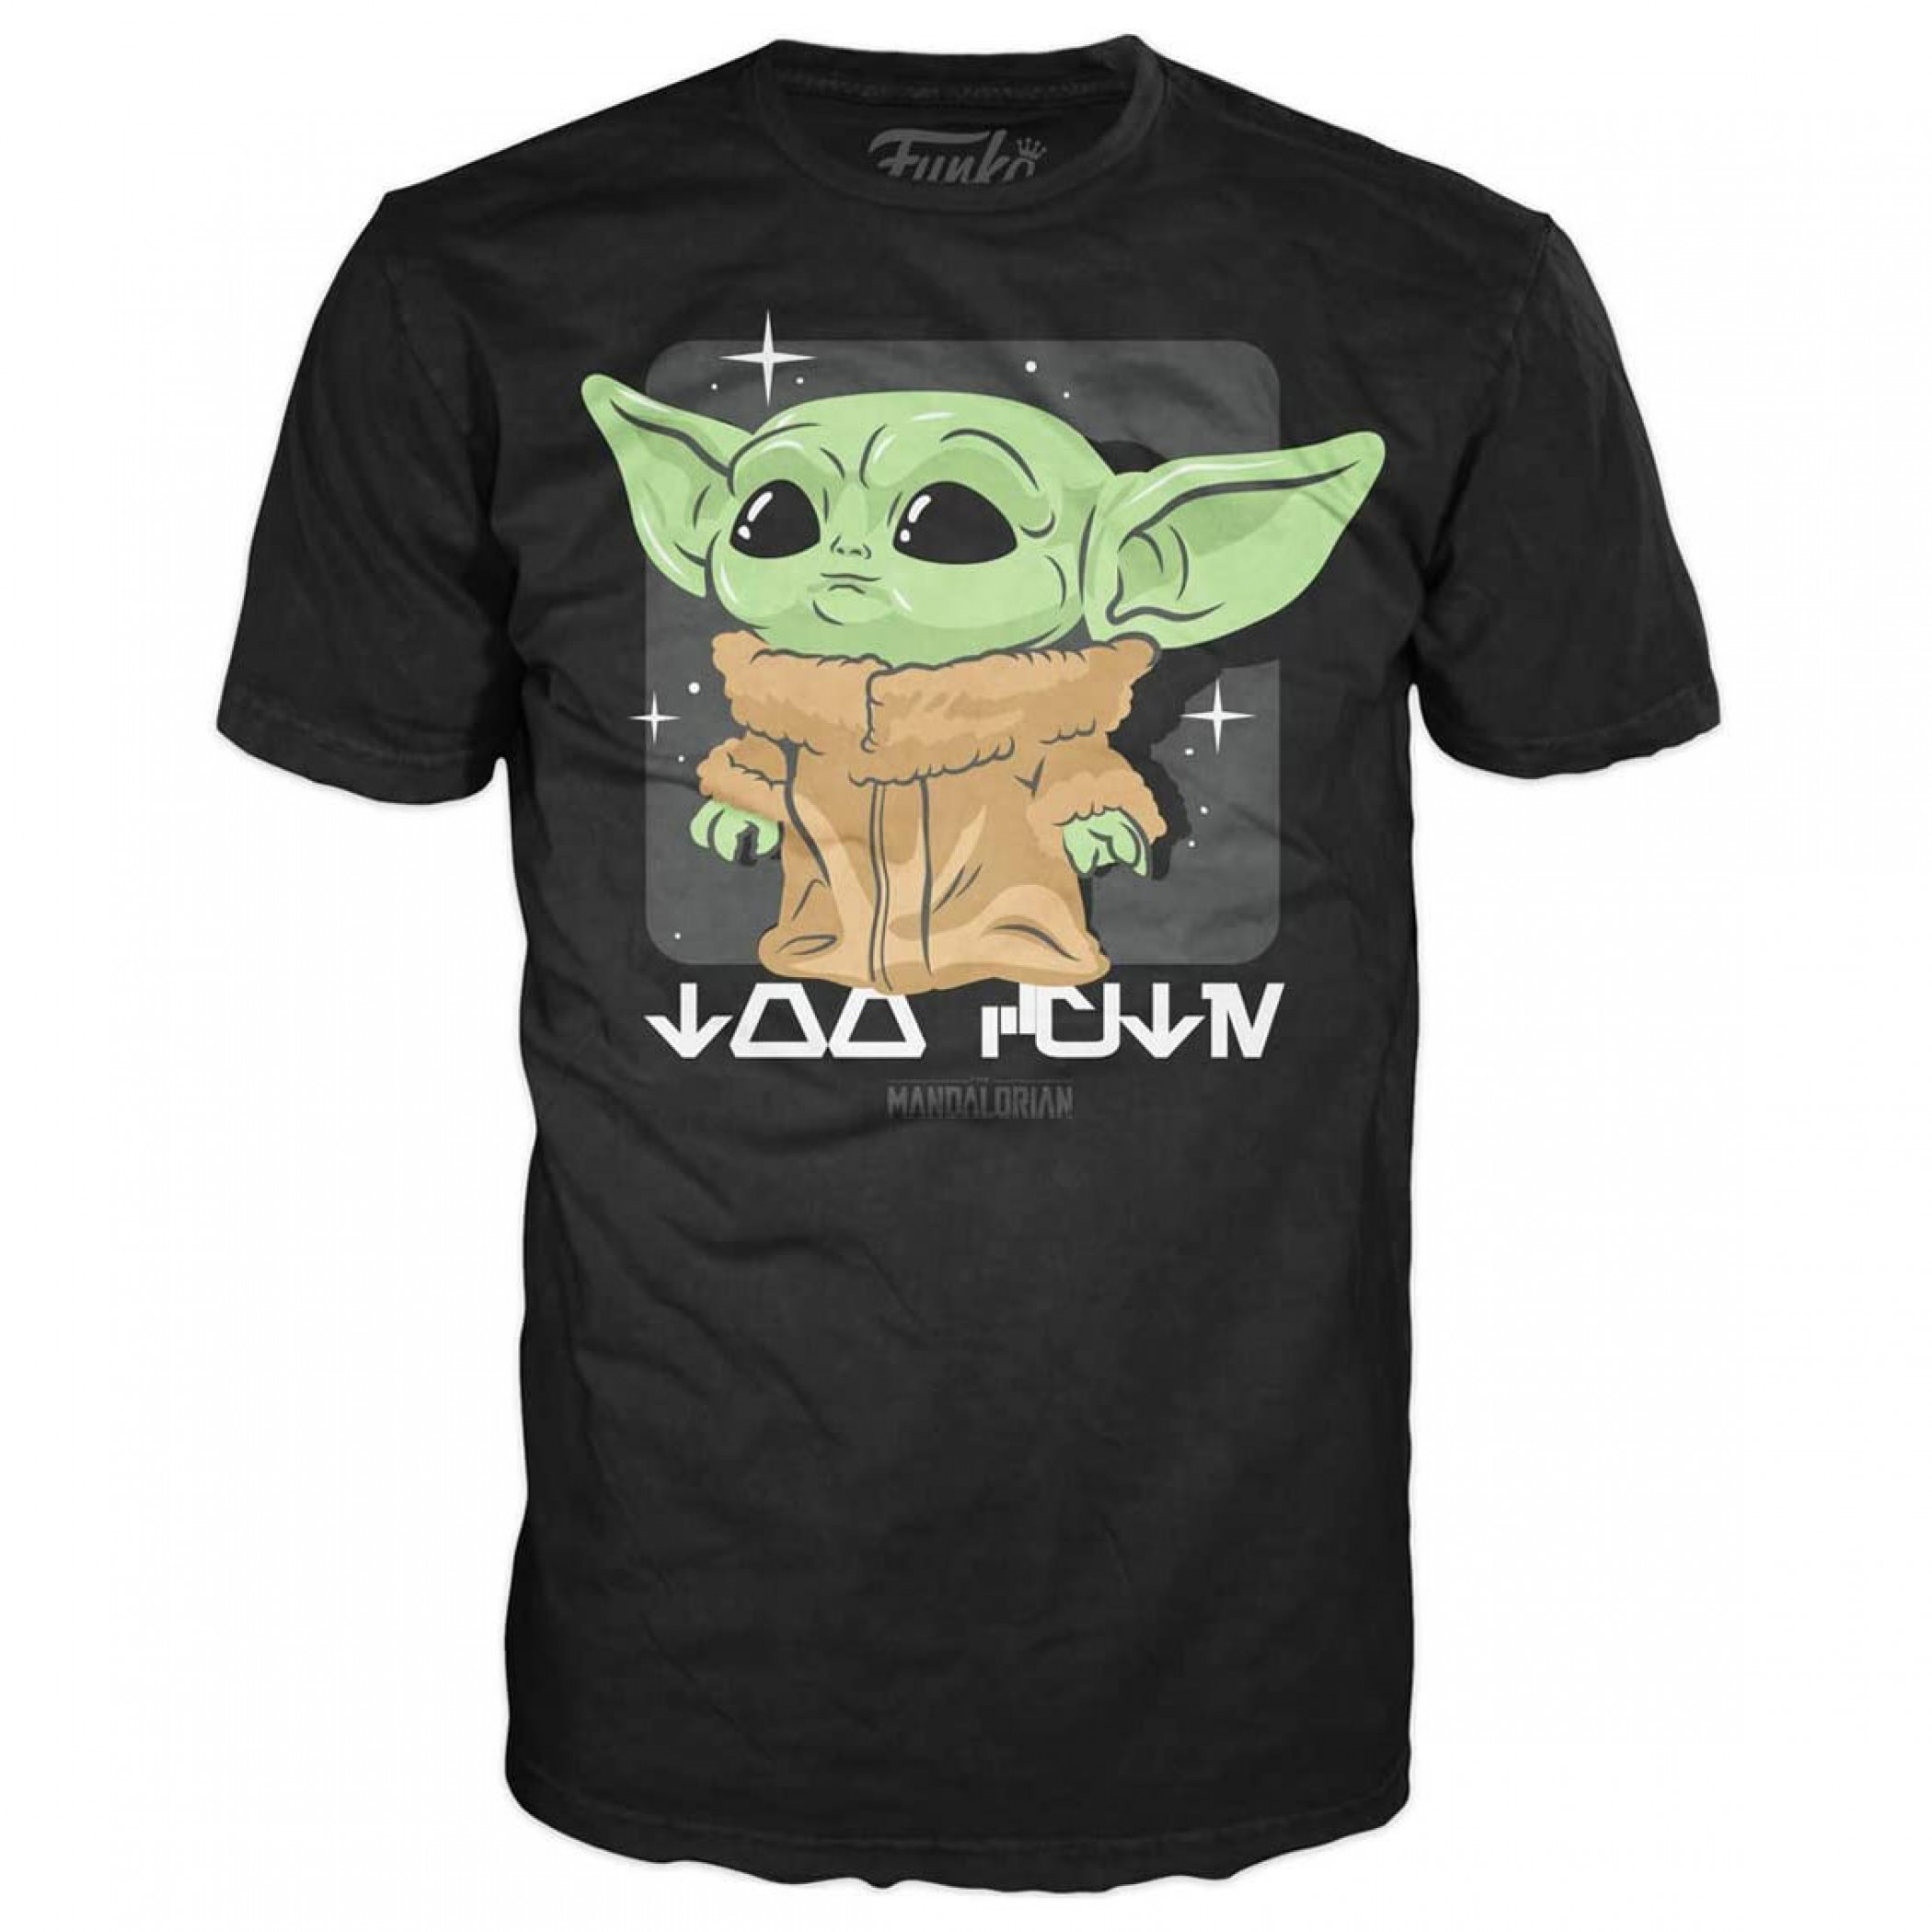 Star Wars The Mandalorian The Child Lookin' Cute T-Shirt